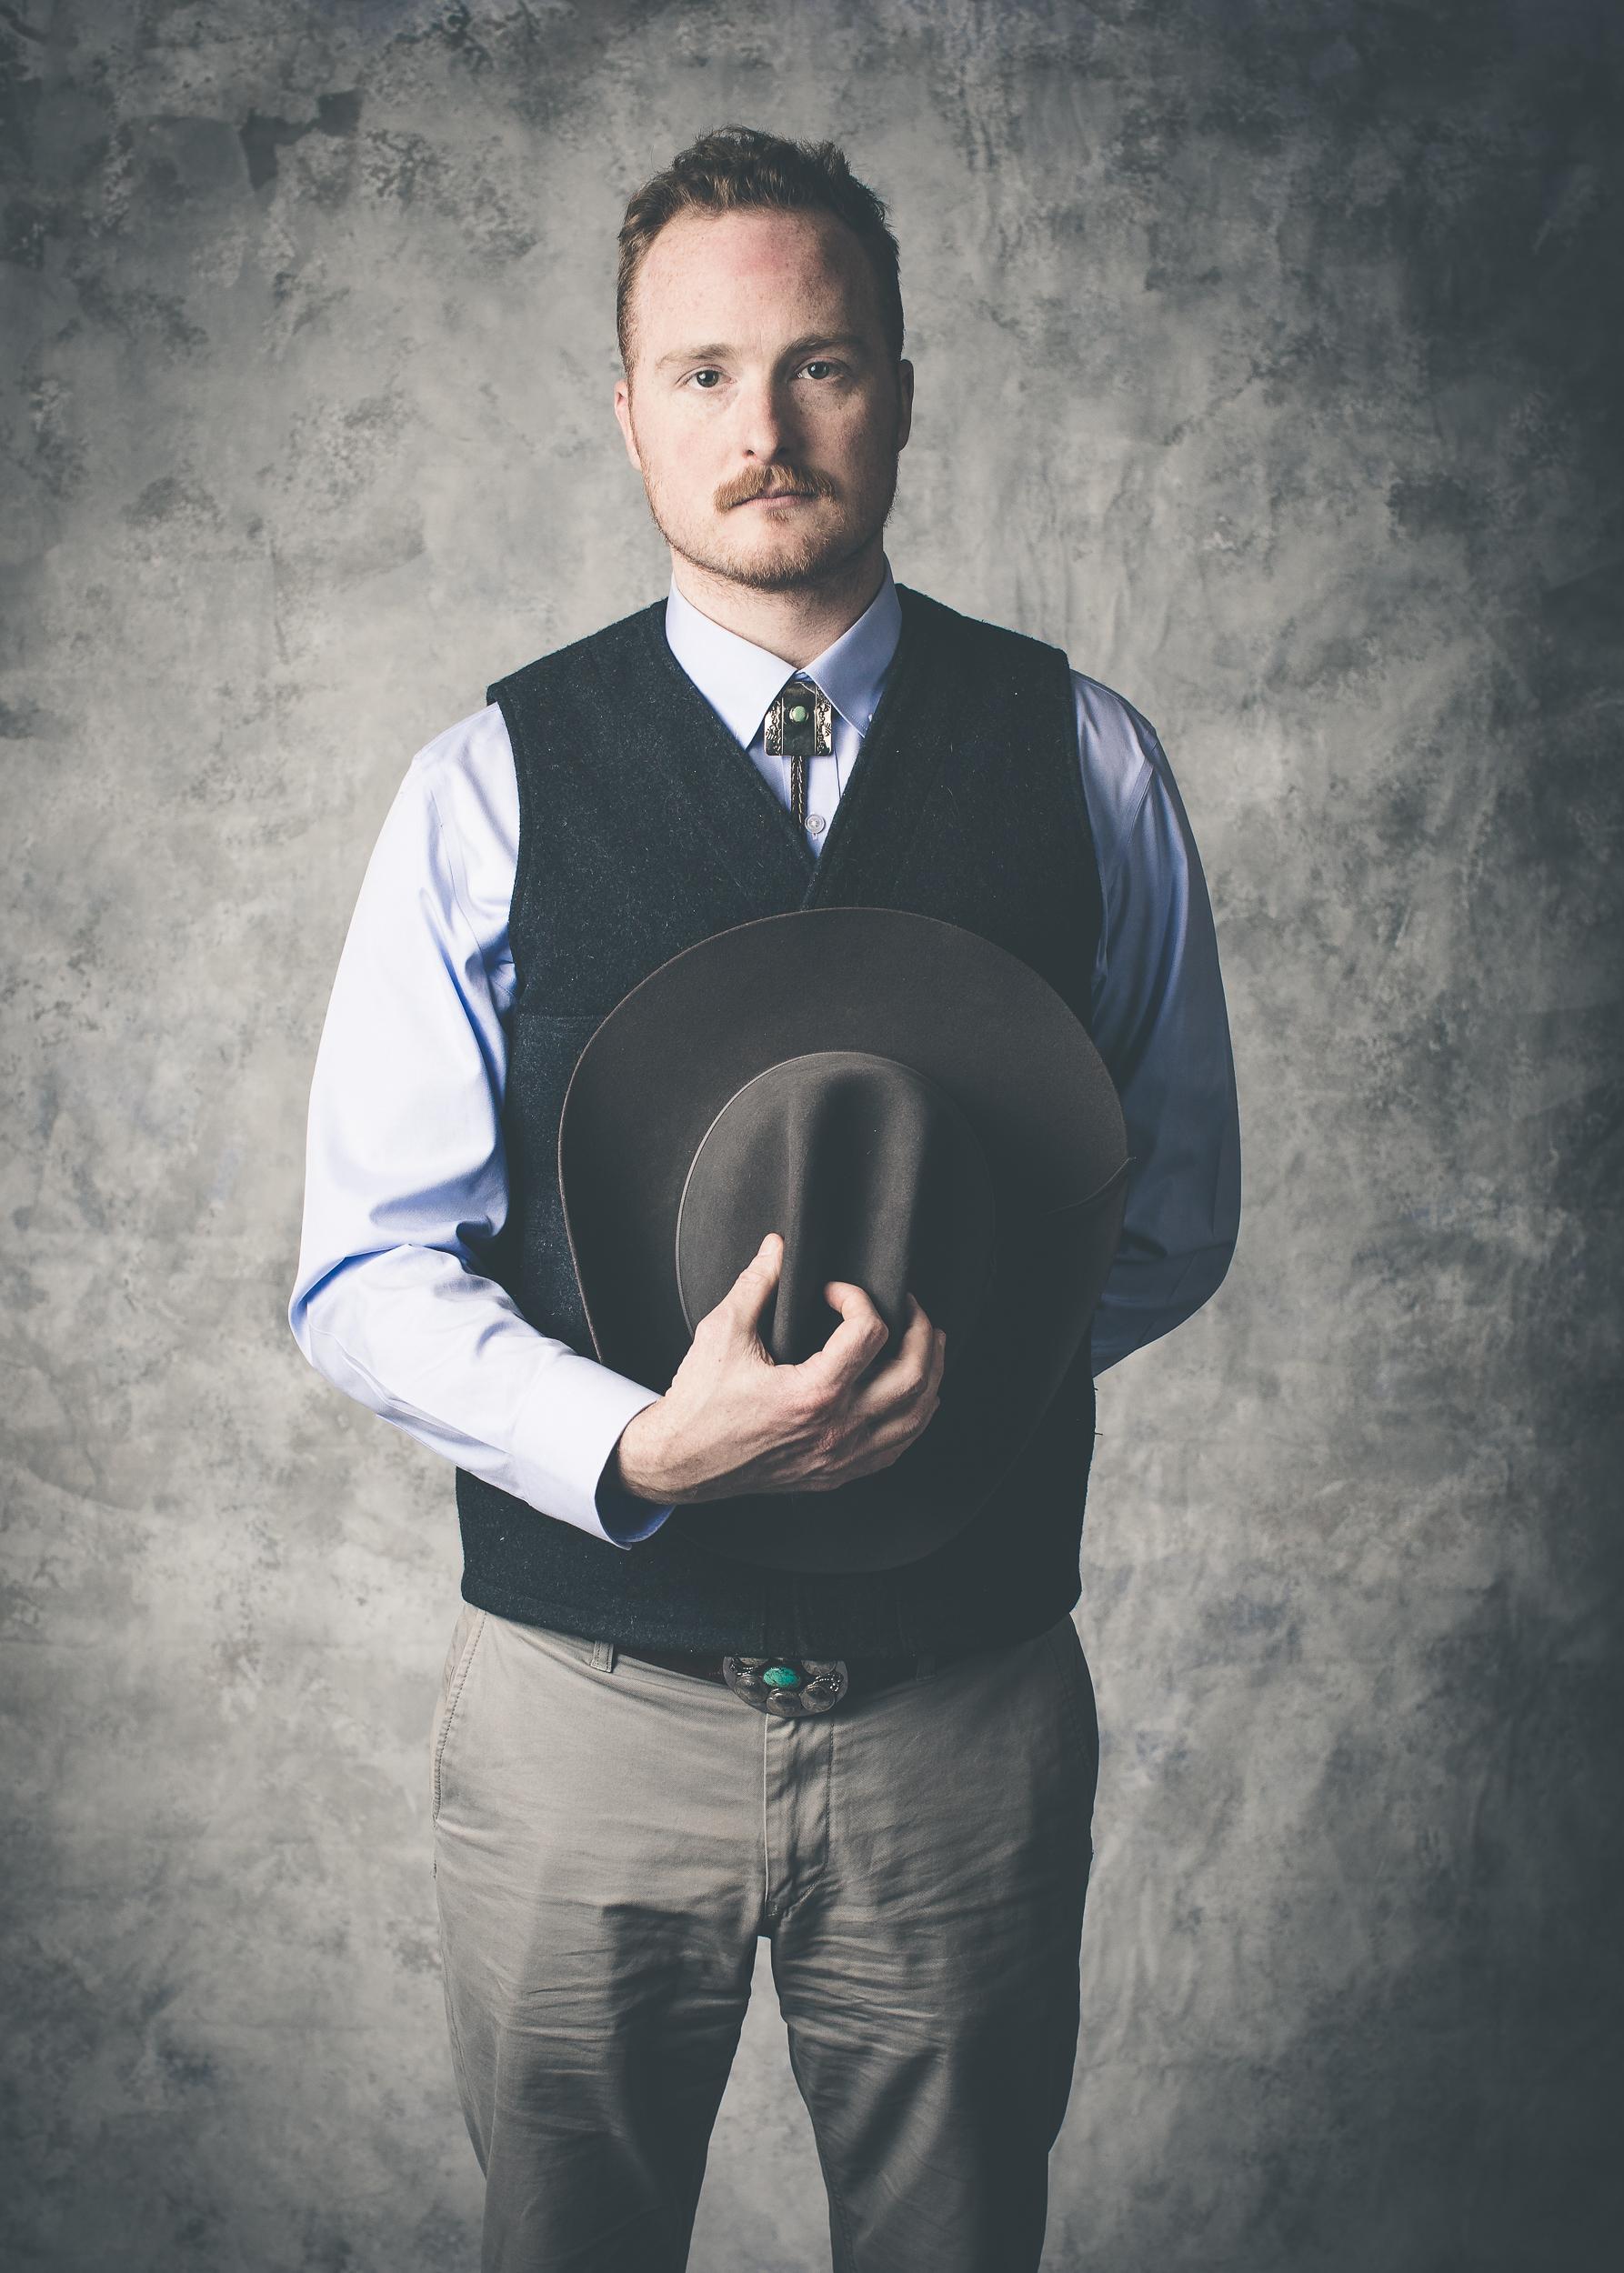 man-with-cowboy-hat-studio-portrait.jpg